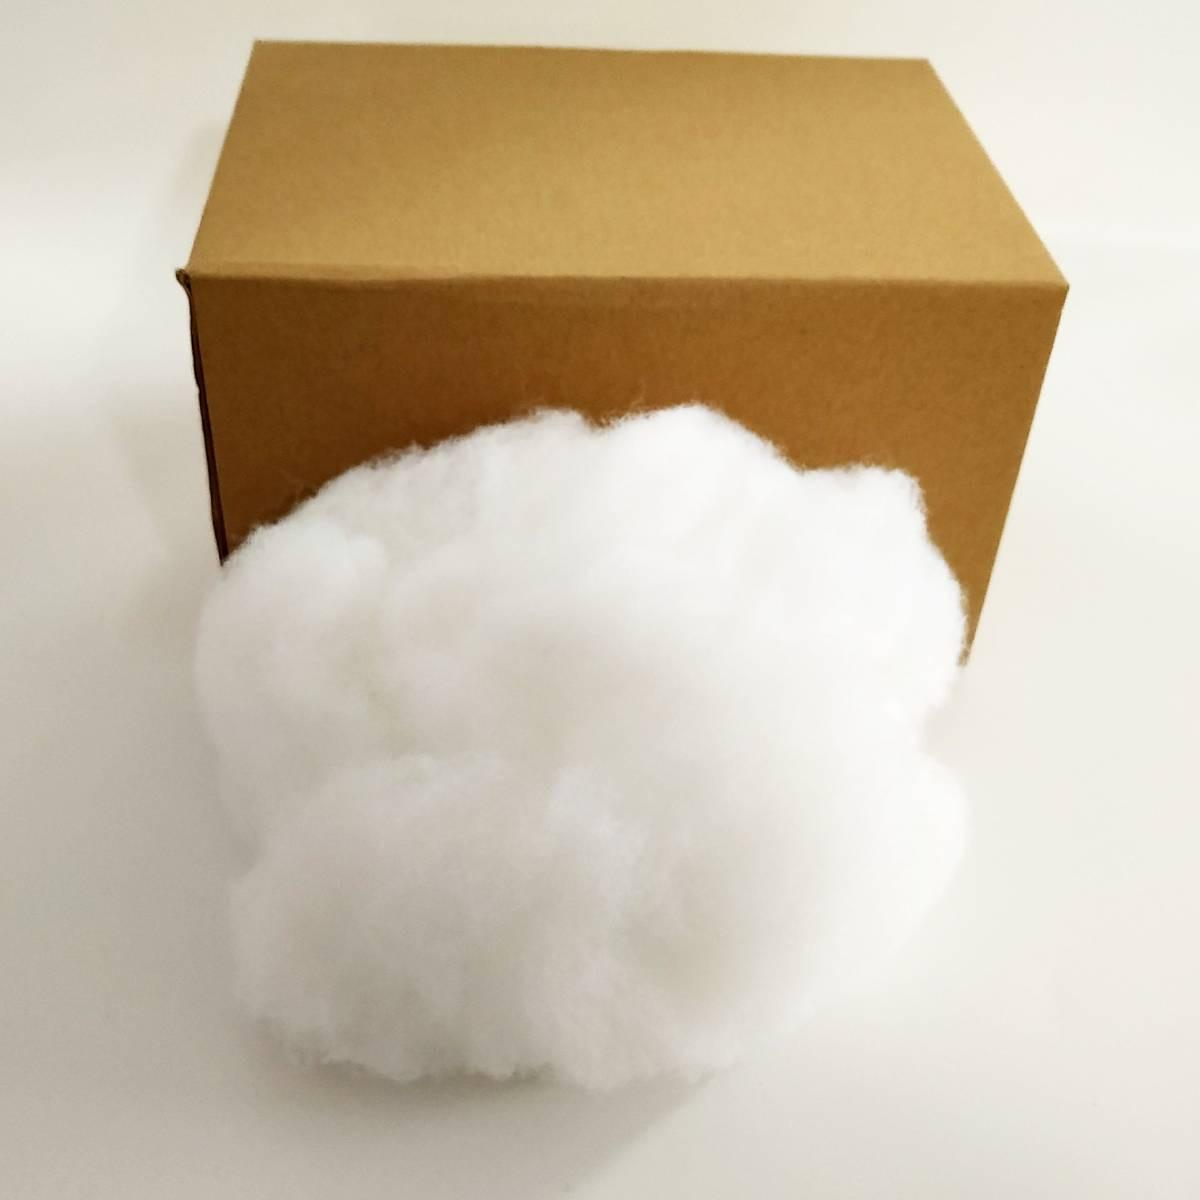 fibres rembourrage polyester achat fibres flocon de mousse. Black Bedroom Furniture Sets. Home Design Ideas